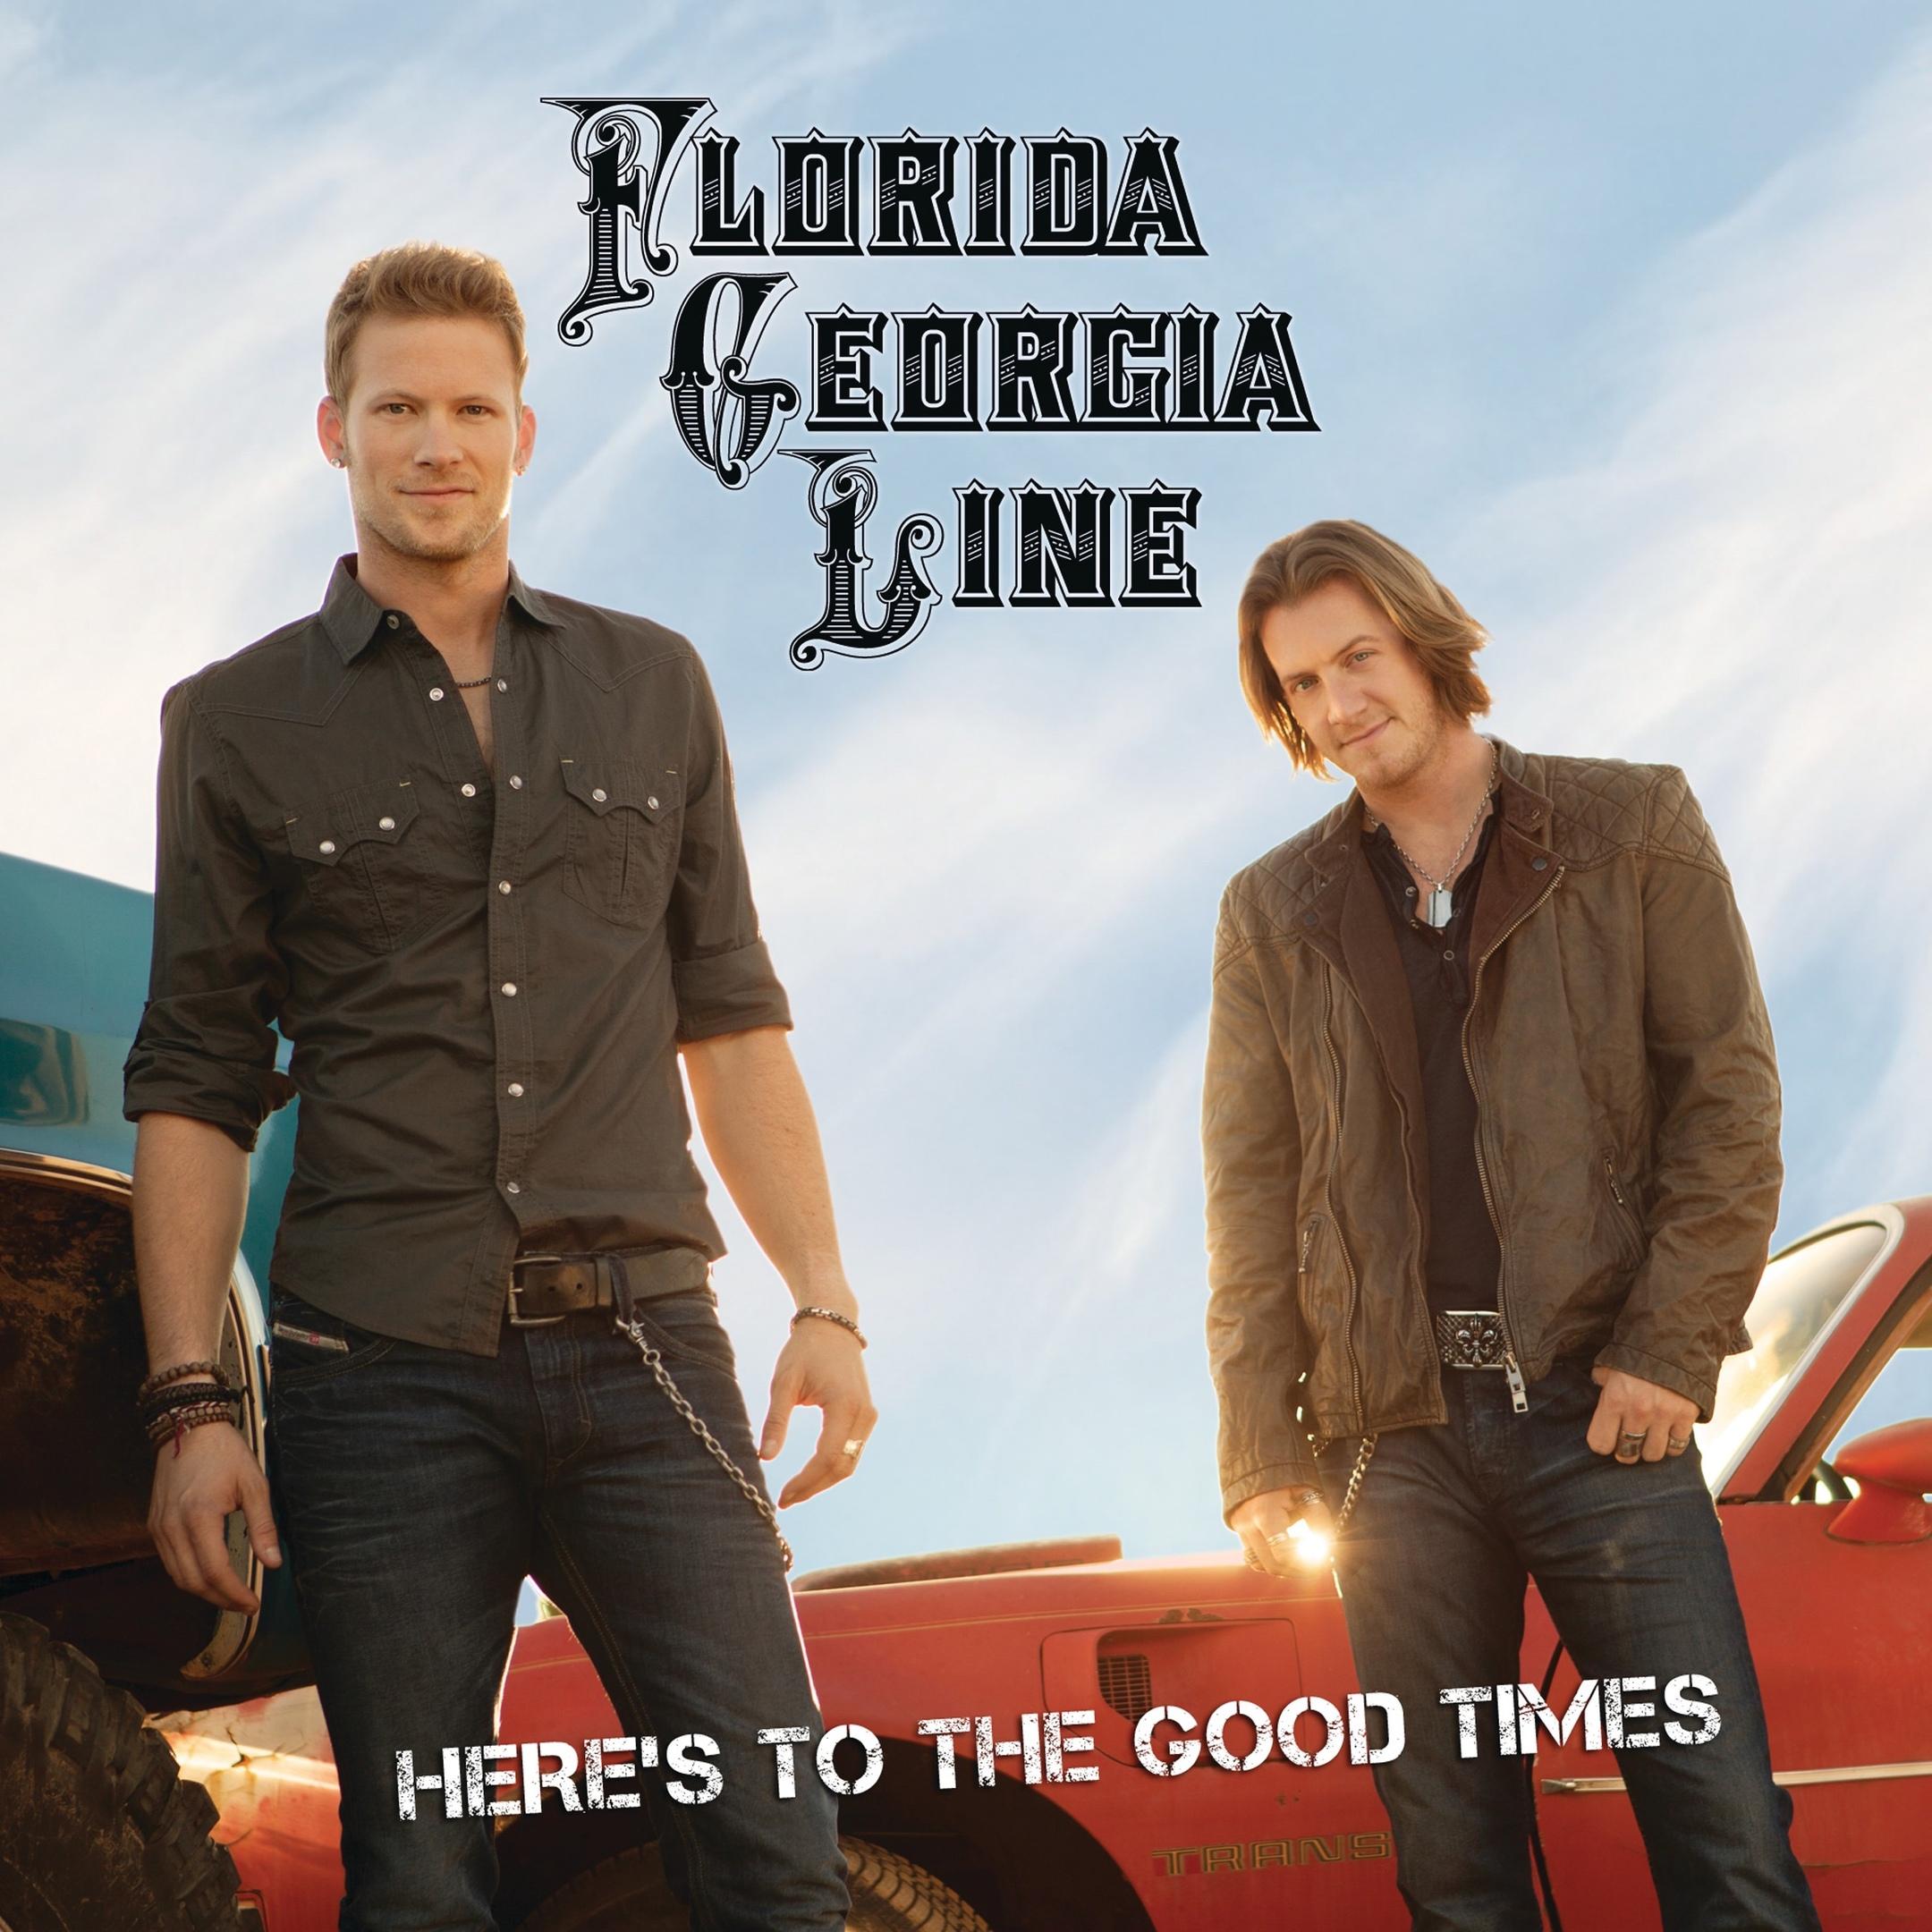 Florida Georgia Line album Here's to the Good Times